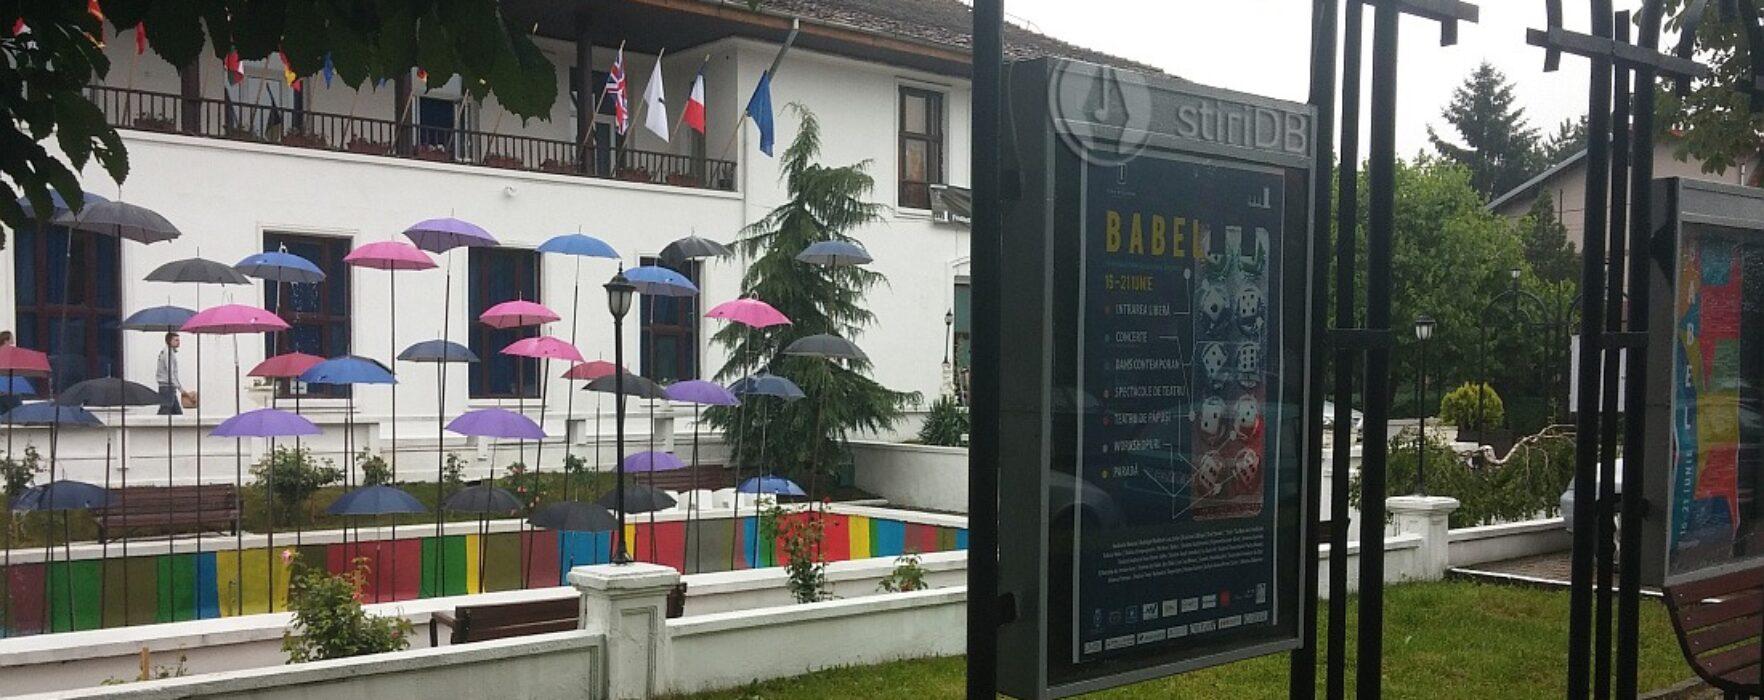 Spectacole Festival Babel – sâmbătă